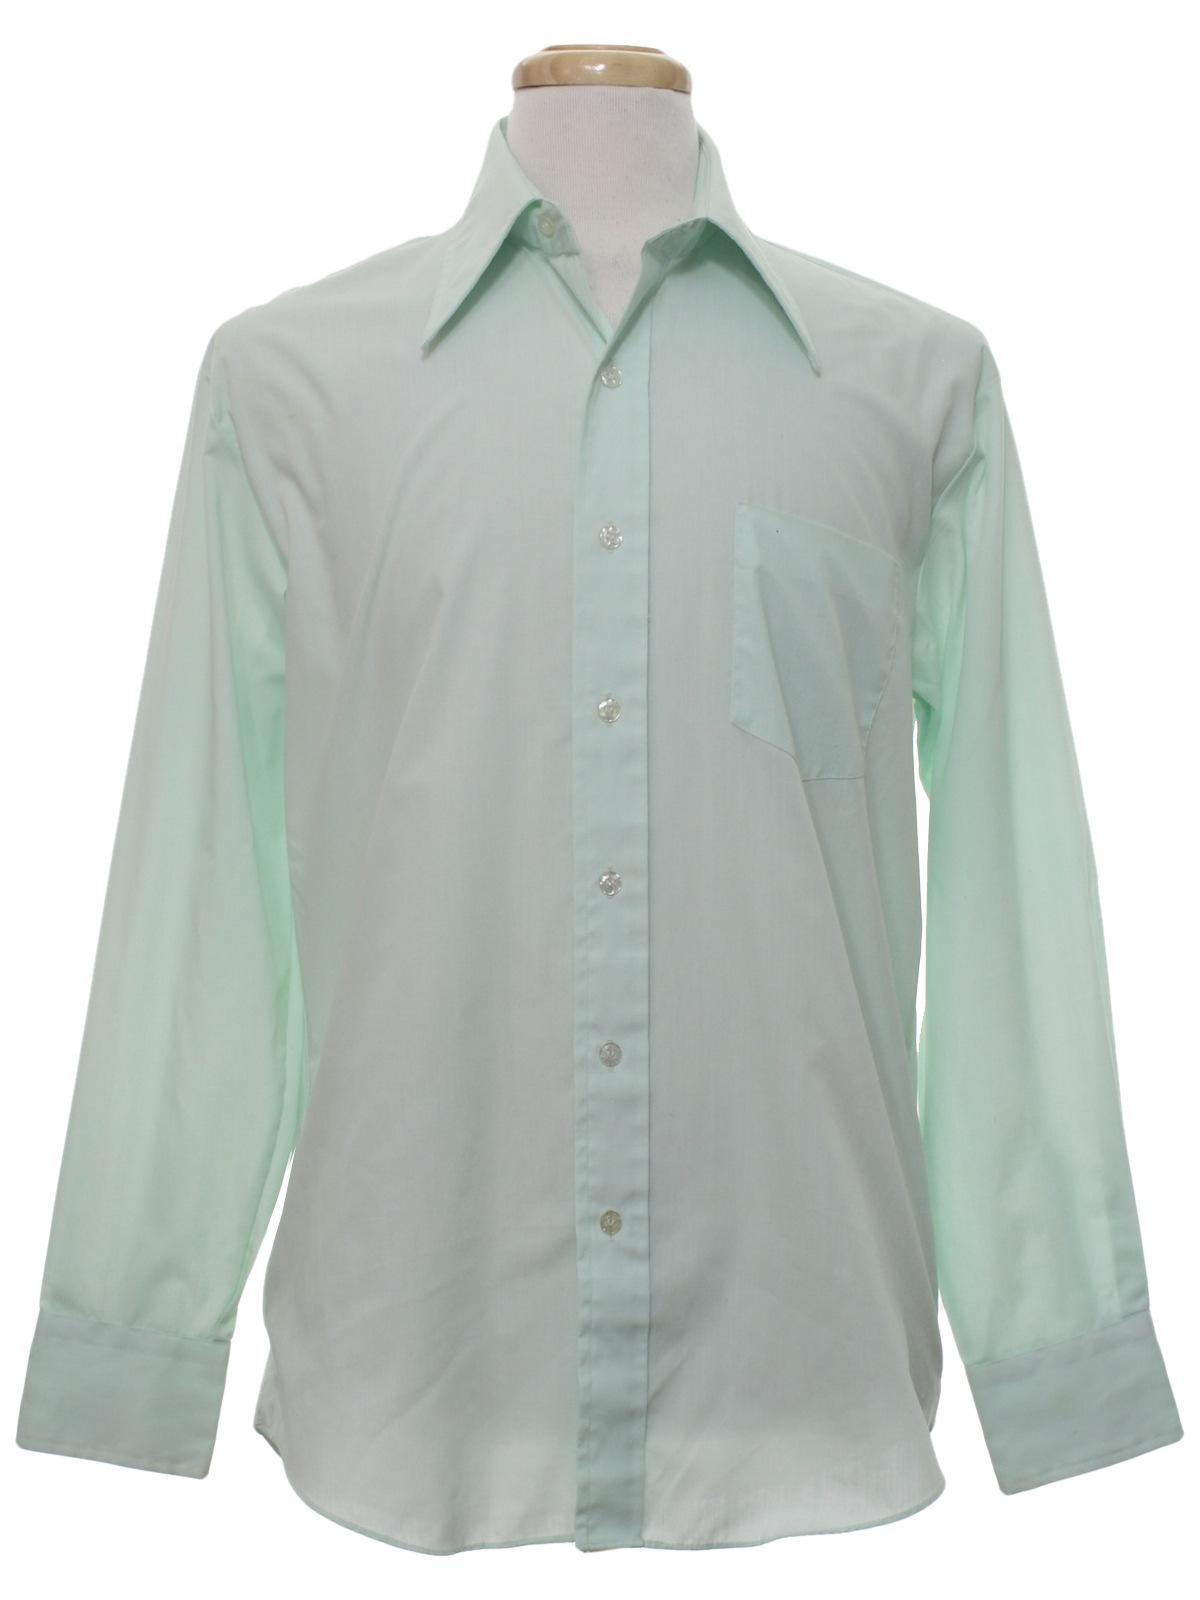 Vintage kmart 70 39 s shirt 70s kmart mens mint green for Kmart button up shirts